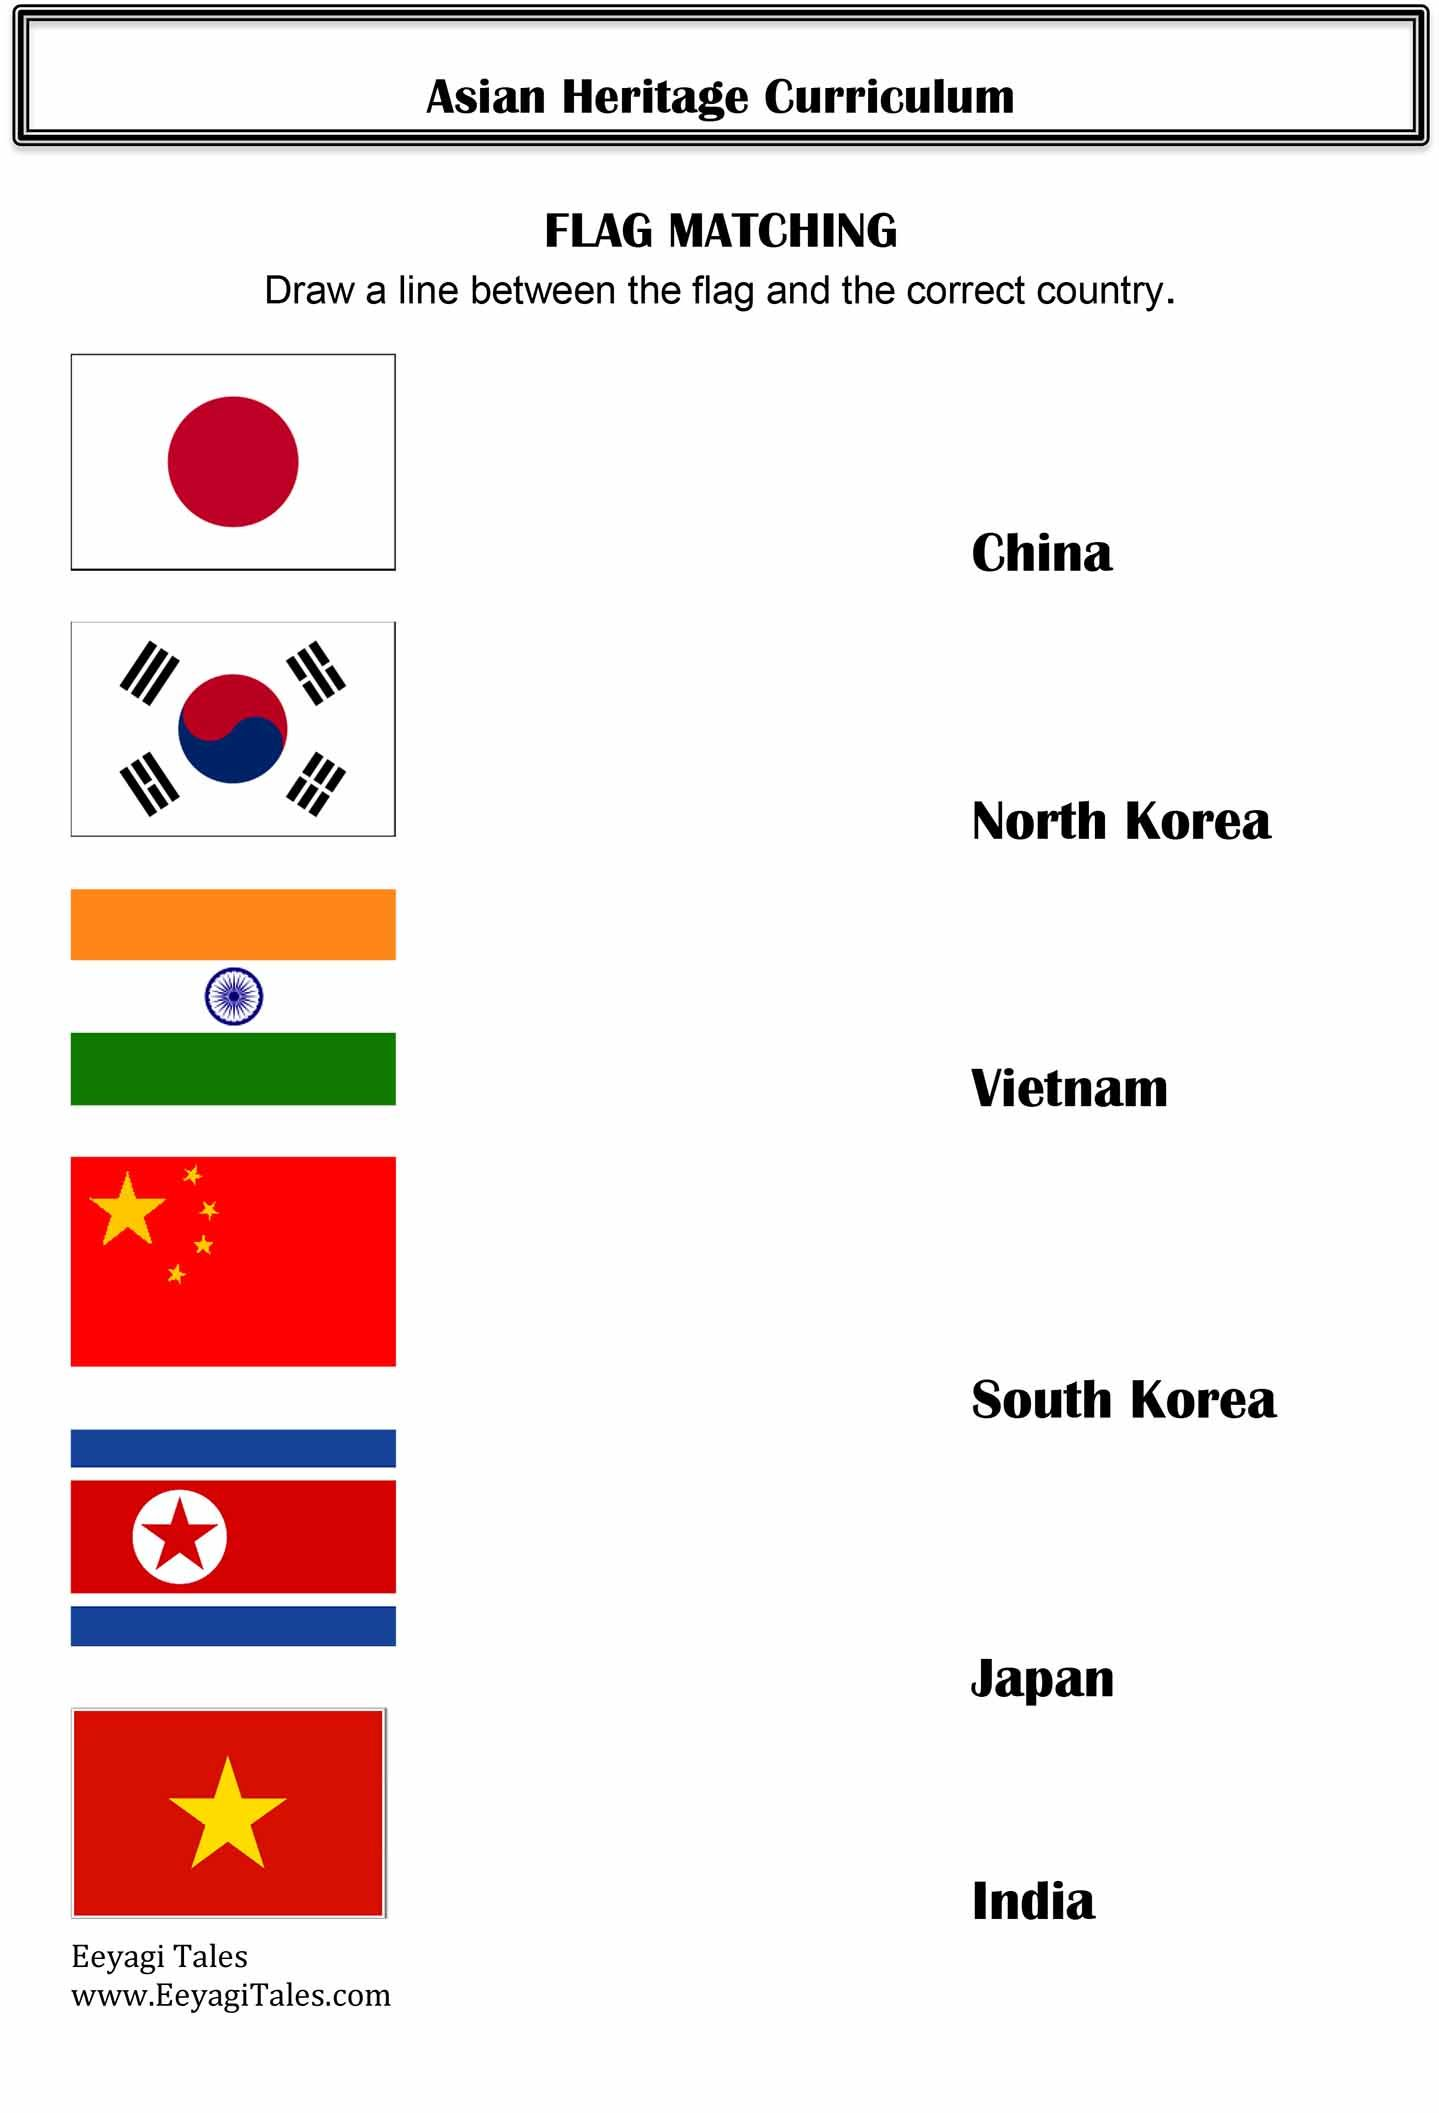 Asian Flag Matching Worksheet Email Eeyagitales Gmail